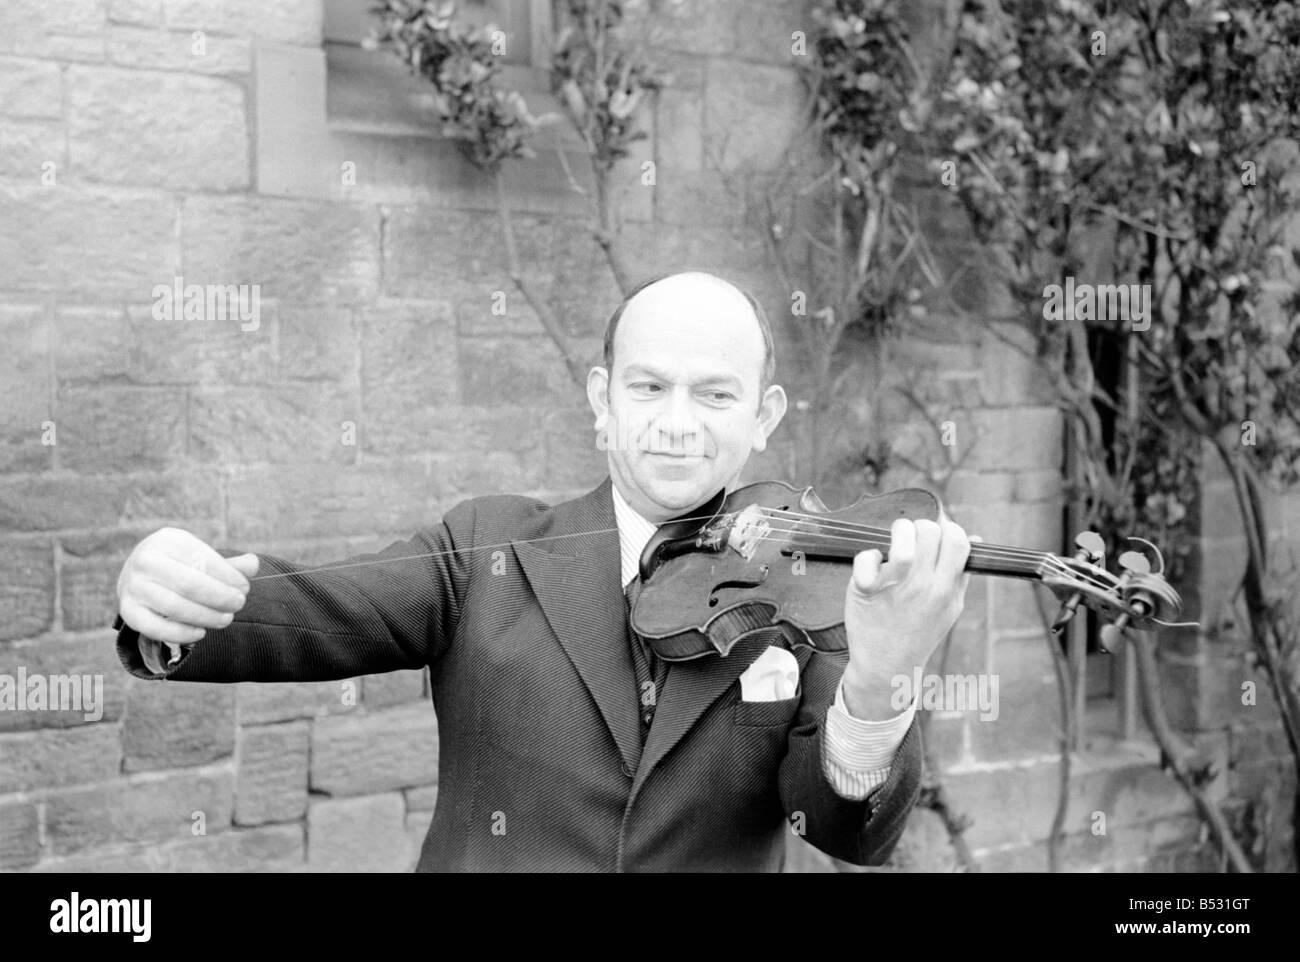 Man repairs strings on violin. January 1939 OL304G - Stock Image